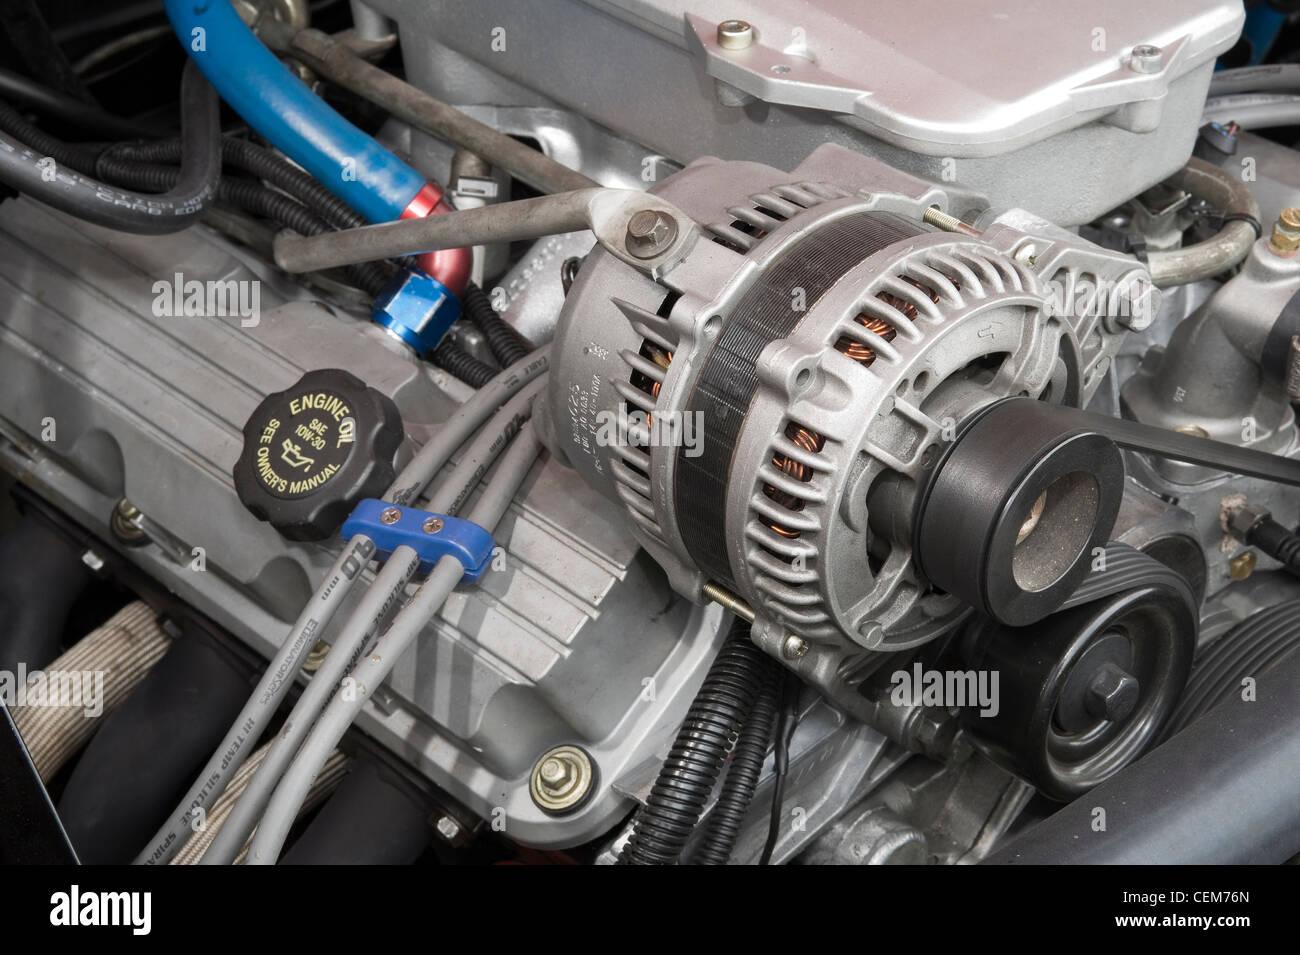 Car Alternator In A Vehicle Engine Bay Stock Photo 43470637 Alamy